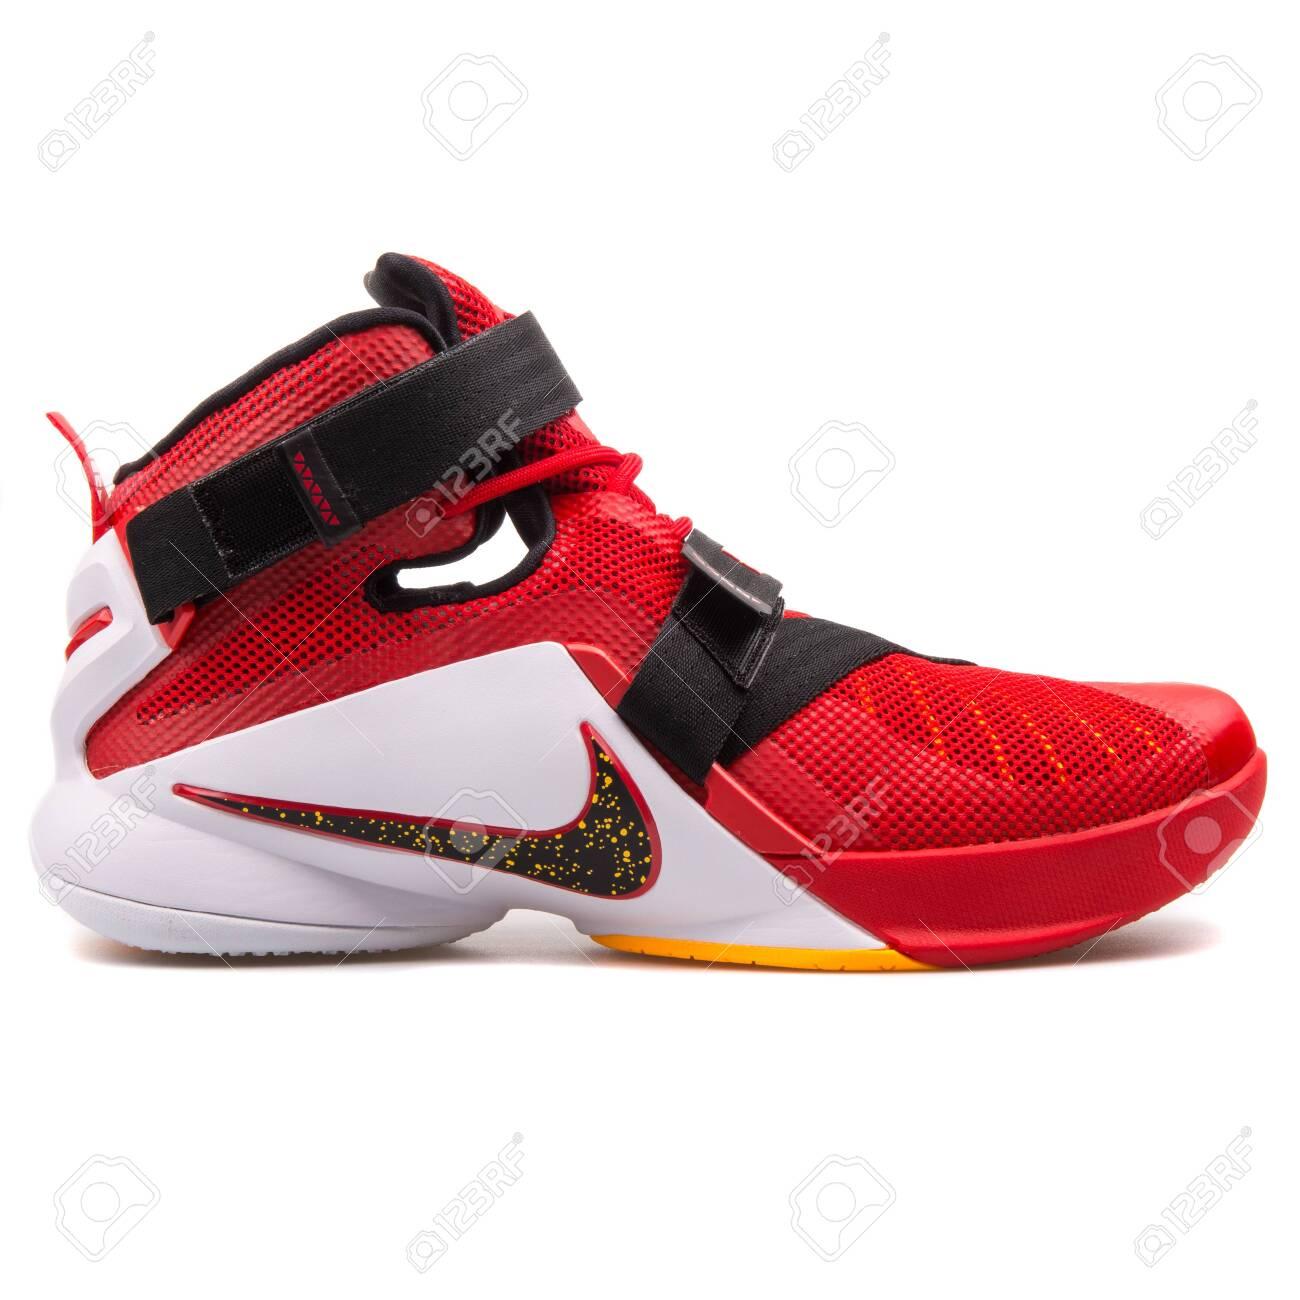 2017: Nike Lebron Soldier IX Red